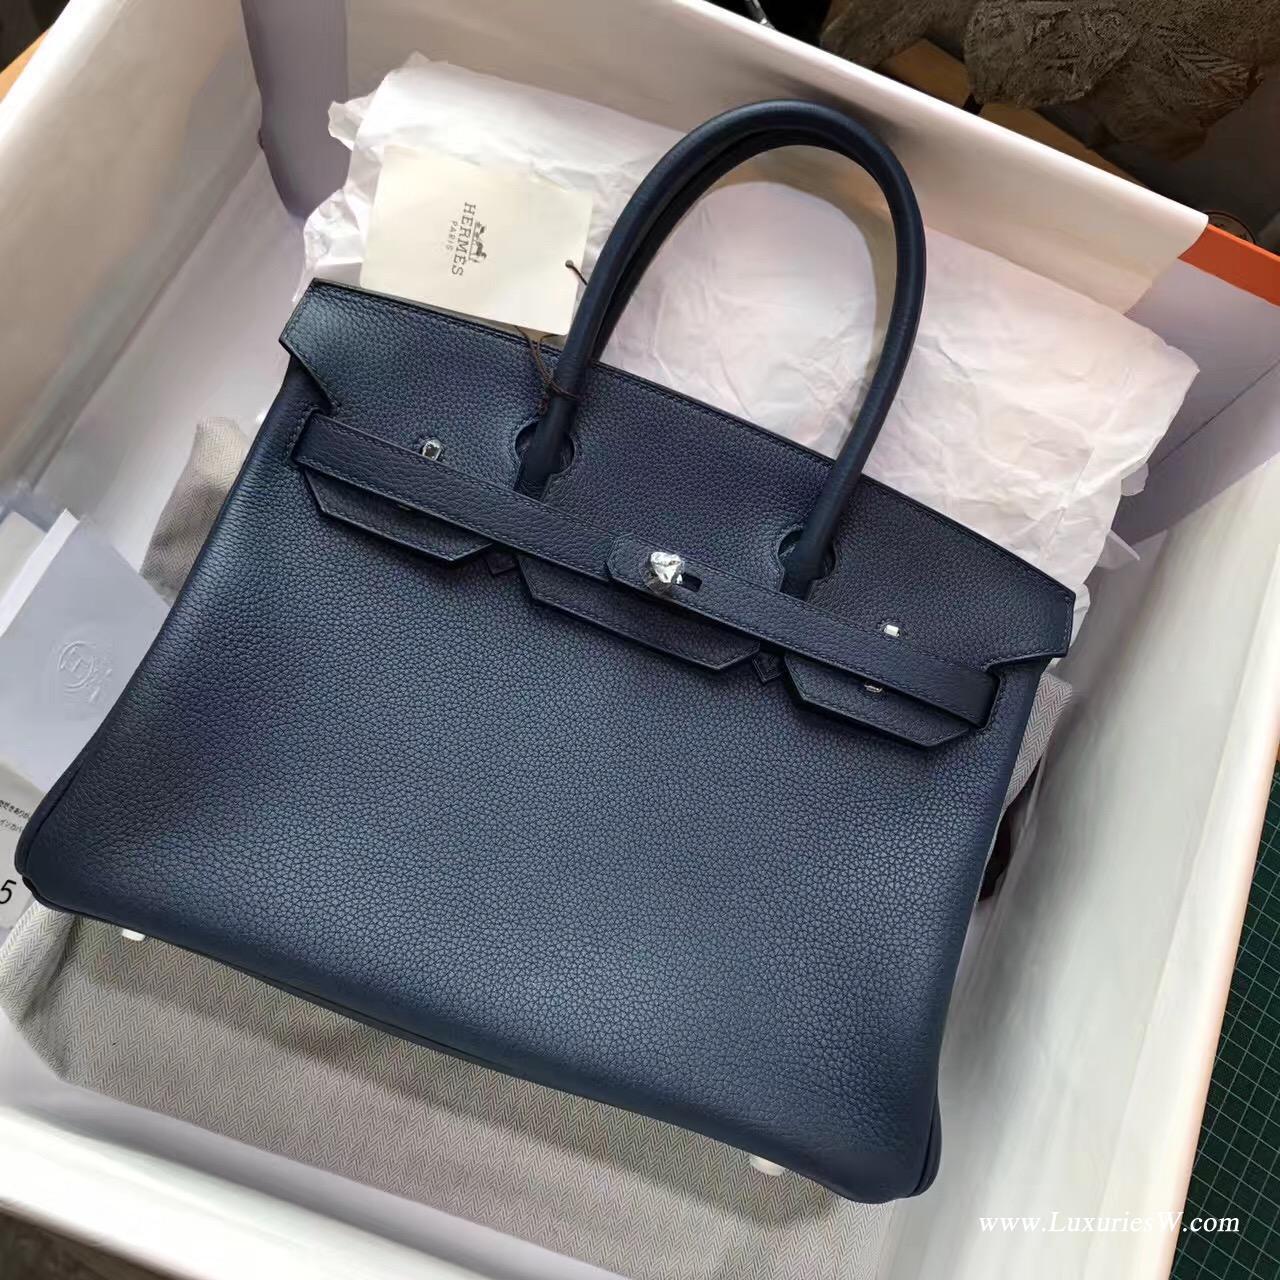 愛馬仕hermes 鉑金包Birkin包袋30 togo CK73 Blue Sphir寶石藍色